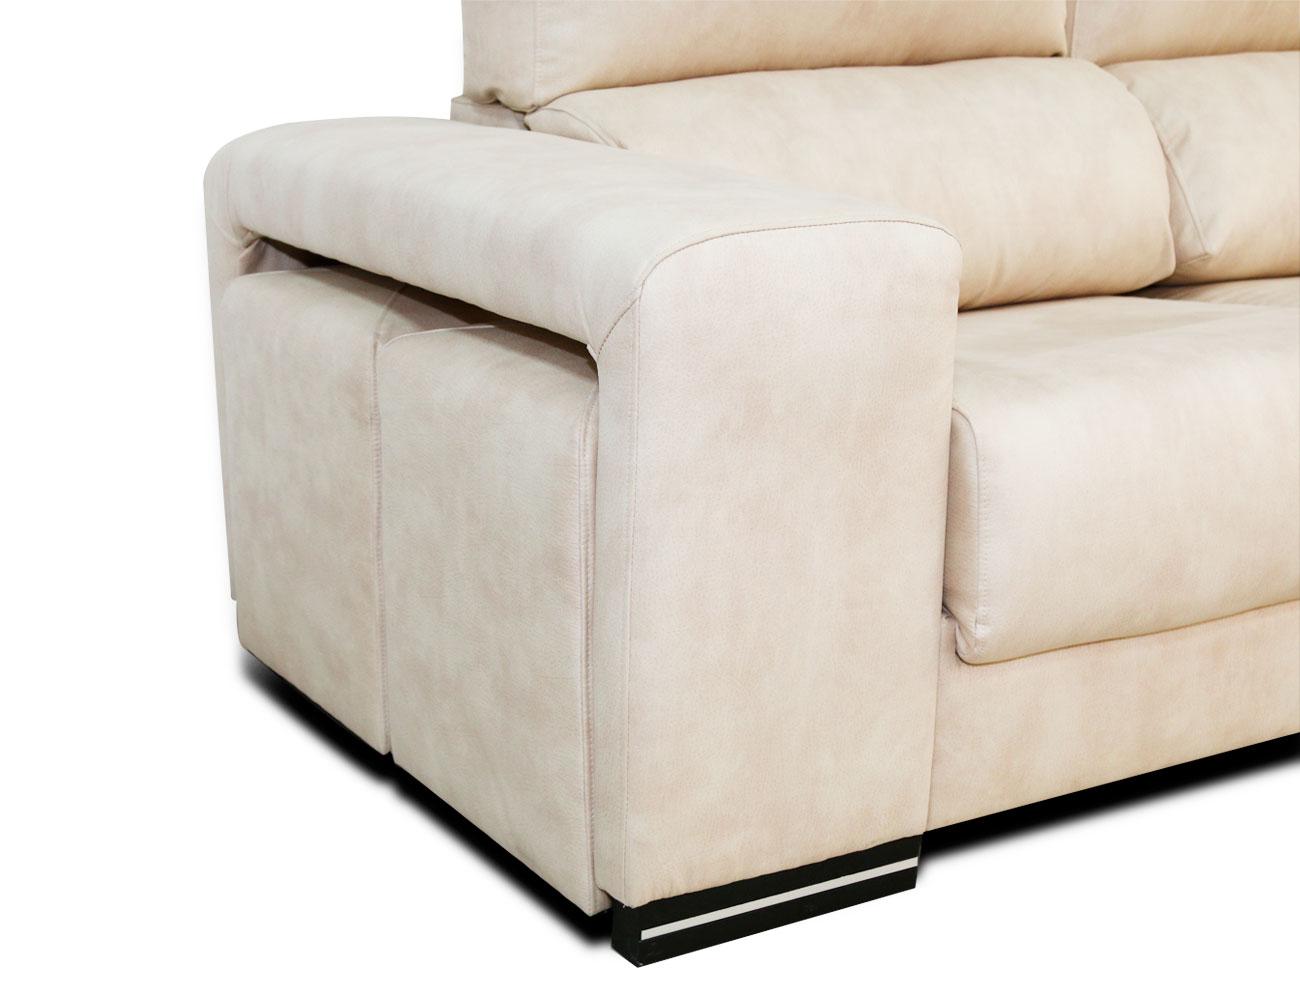 Sofa chaiselongue rincon arcon puf taburetes surf blanco 1